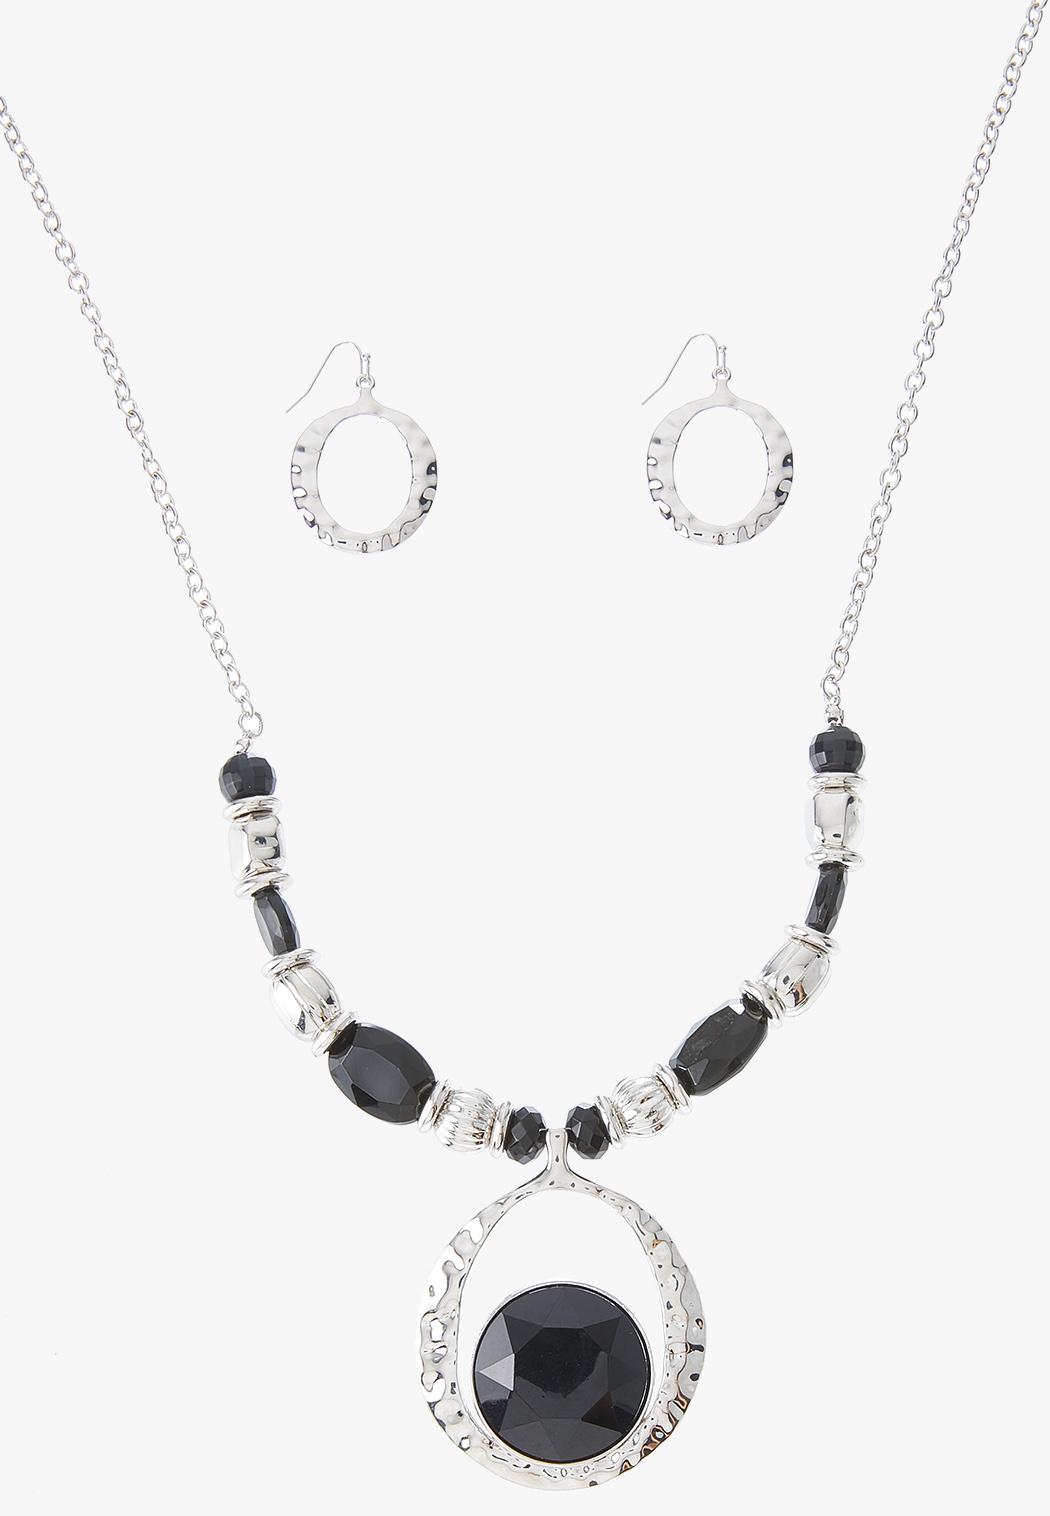 Silver Acrylic Pendant Necklace Earring Set